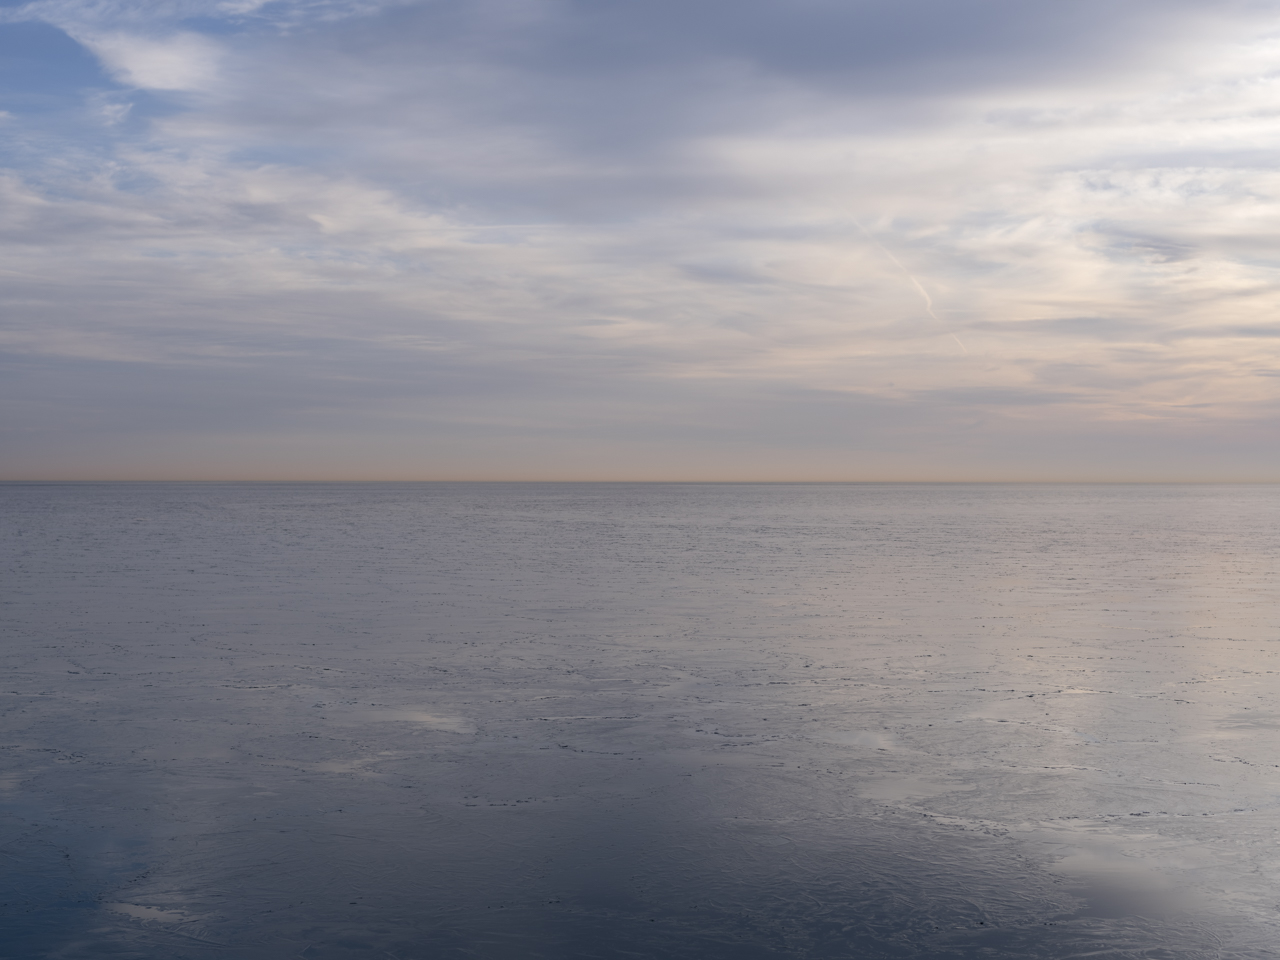 pastel blue skies with a yellow horizon on Lake Michigan